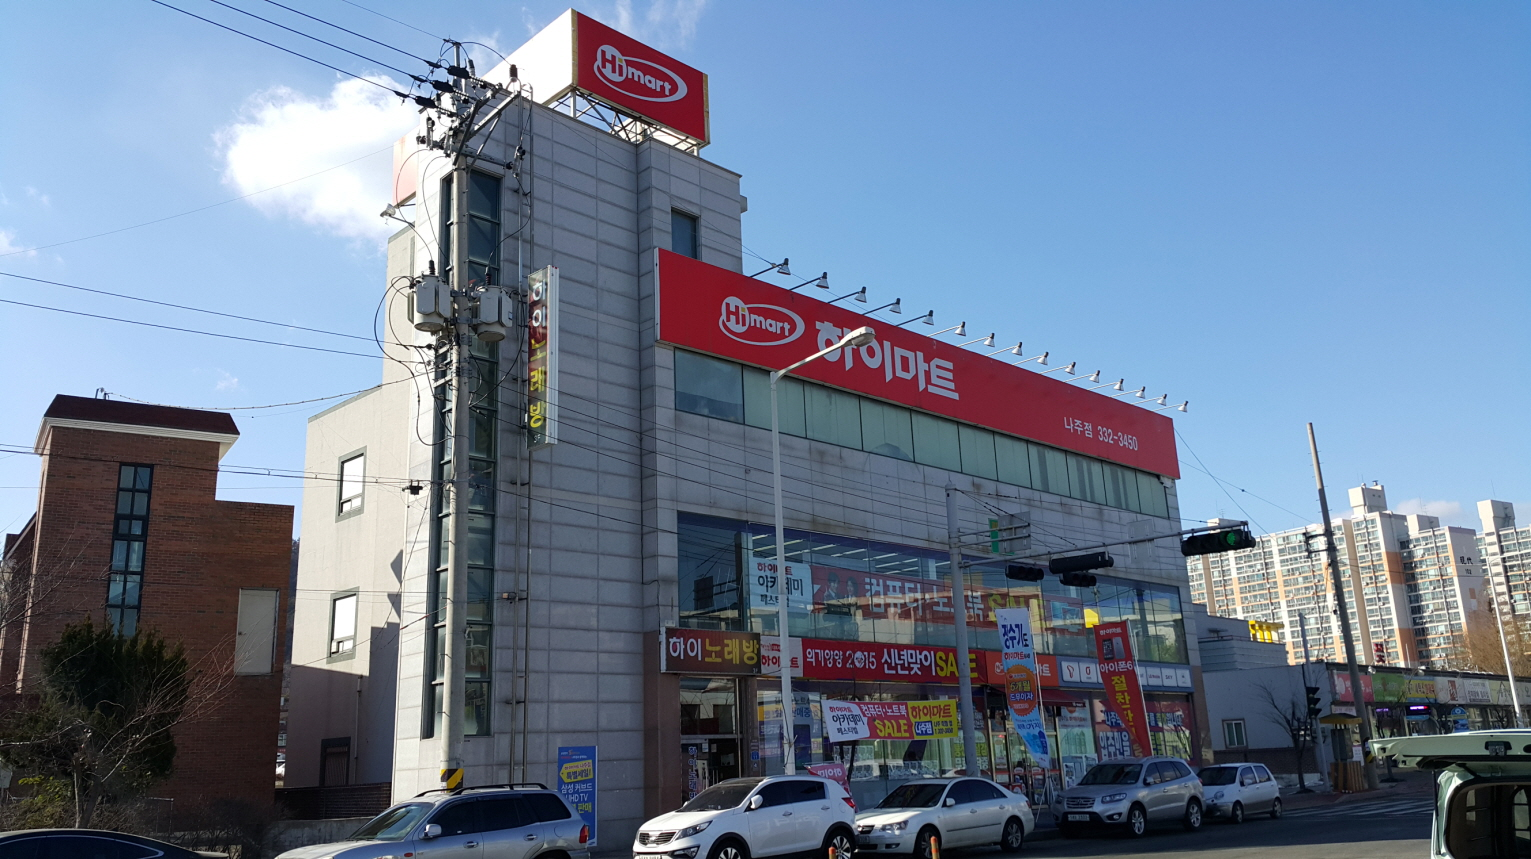 Lotte Hi-mart – Naju Branch (롯데 하이마트 (나주점))